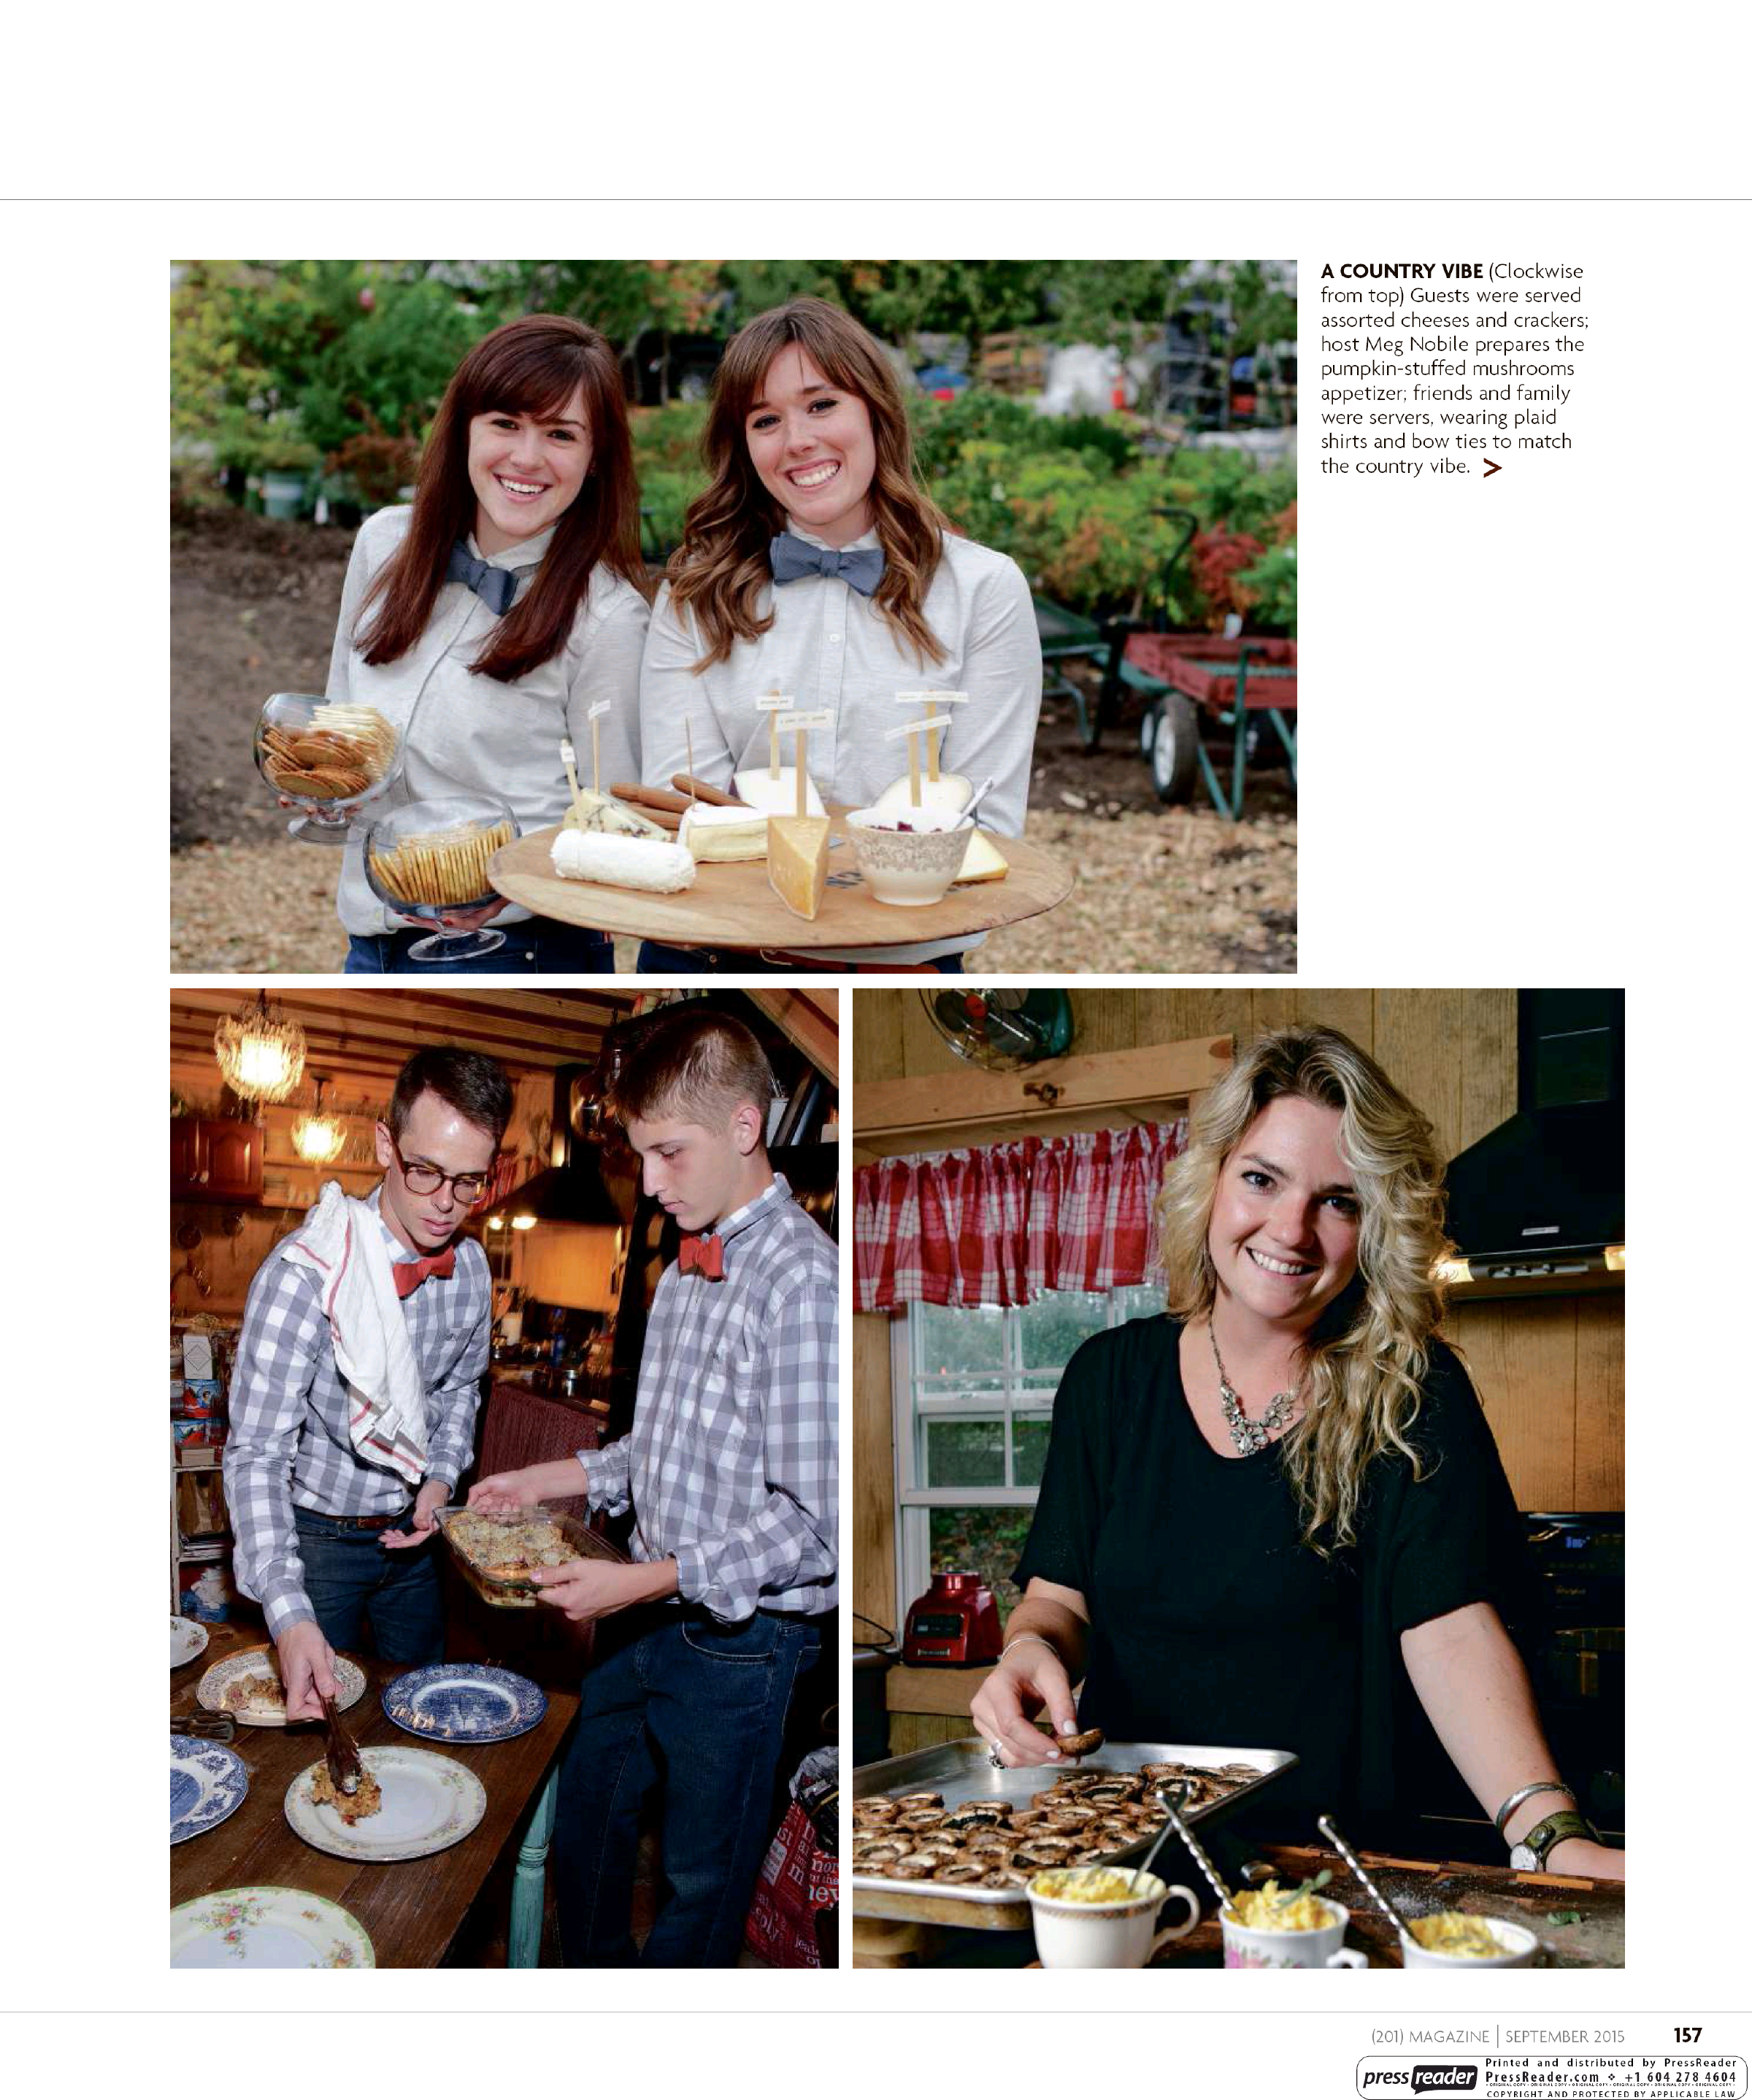 (201) Magazine - 201 - 1 Sep 2015 - Page #164.jpg